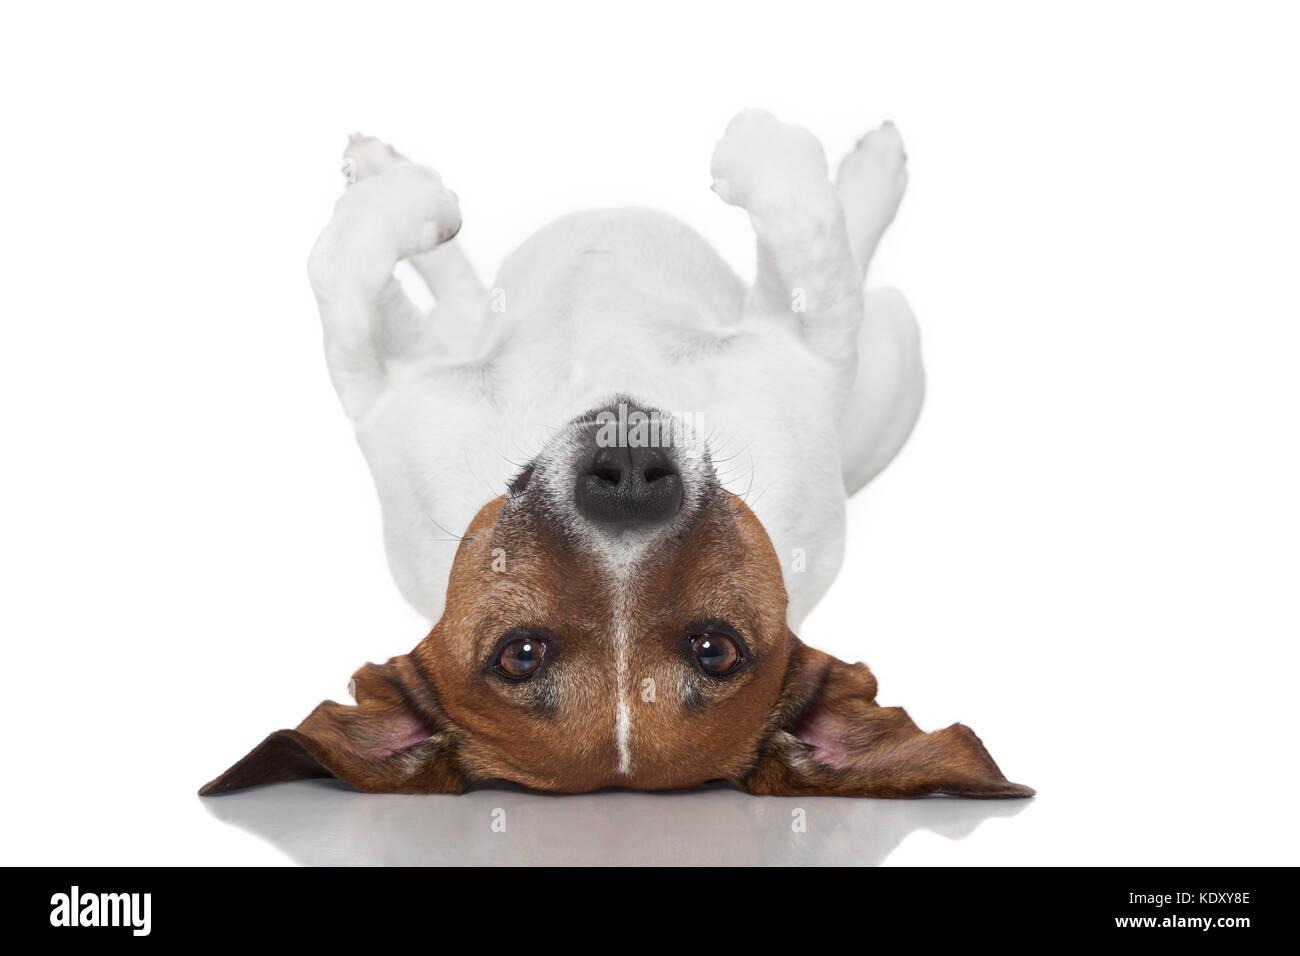 dog  laying upside down on back - Stock Image